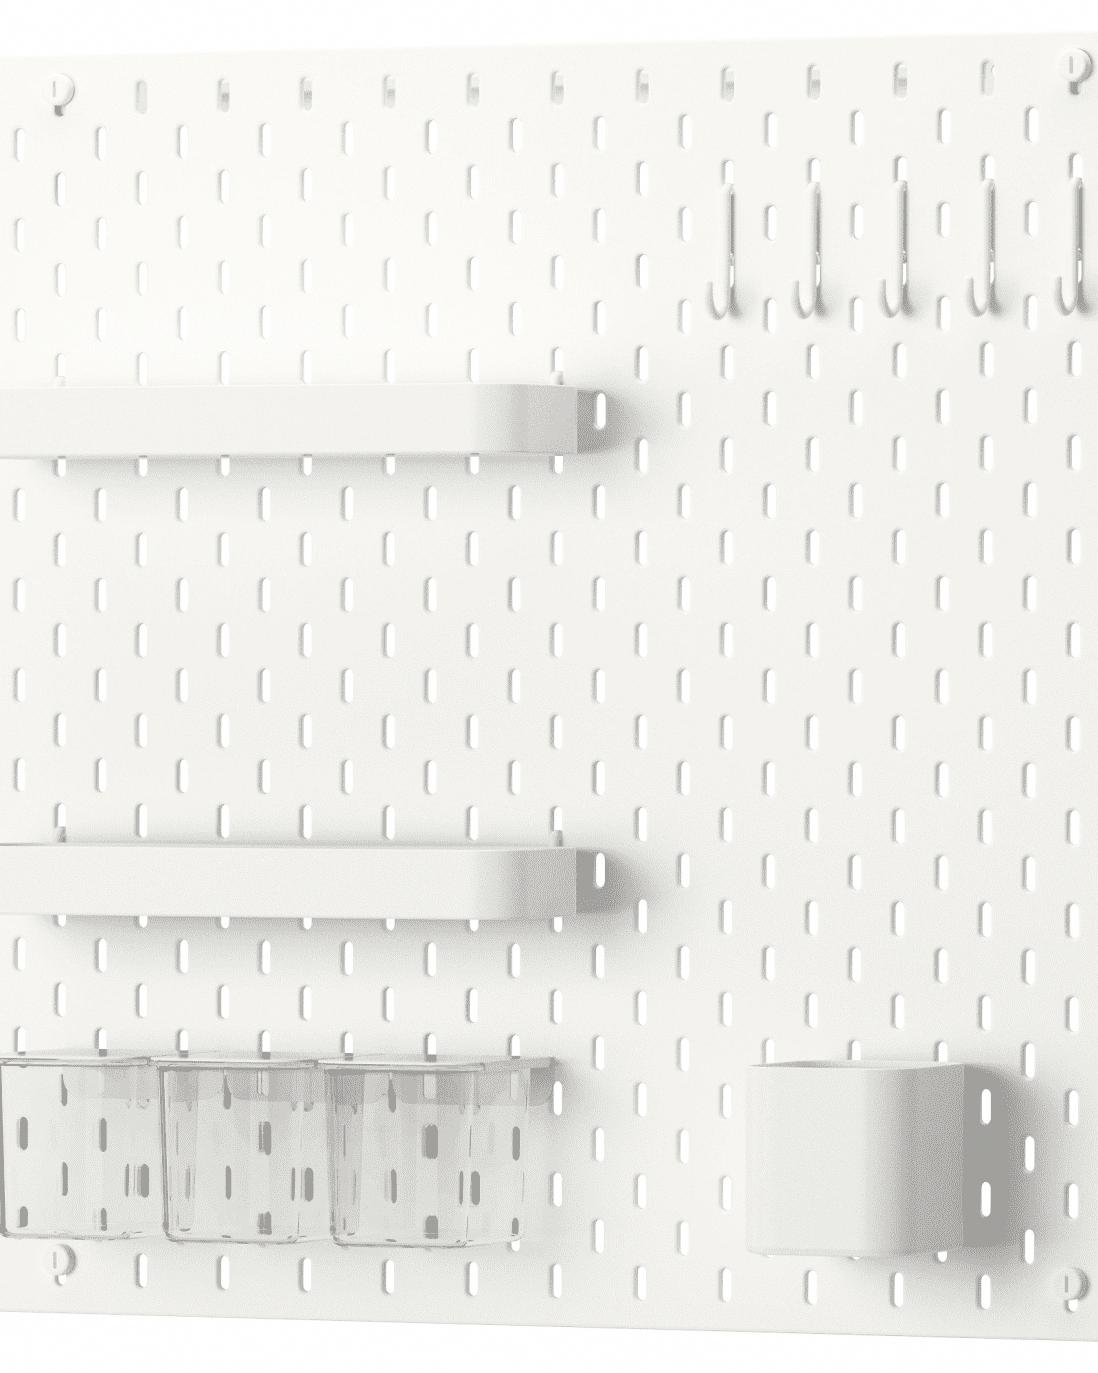 Ikea Skadis Pegboard Ideas Inspiration Apartment Therapy Ikeabathroom Small Bathroom Decor